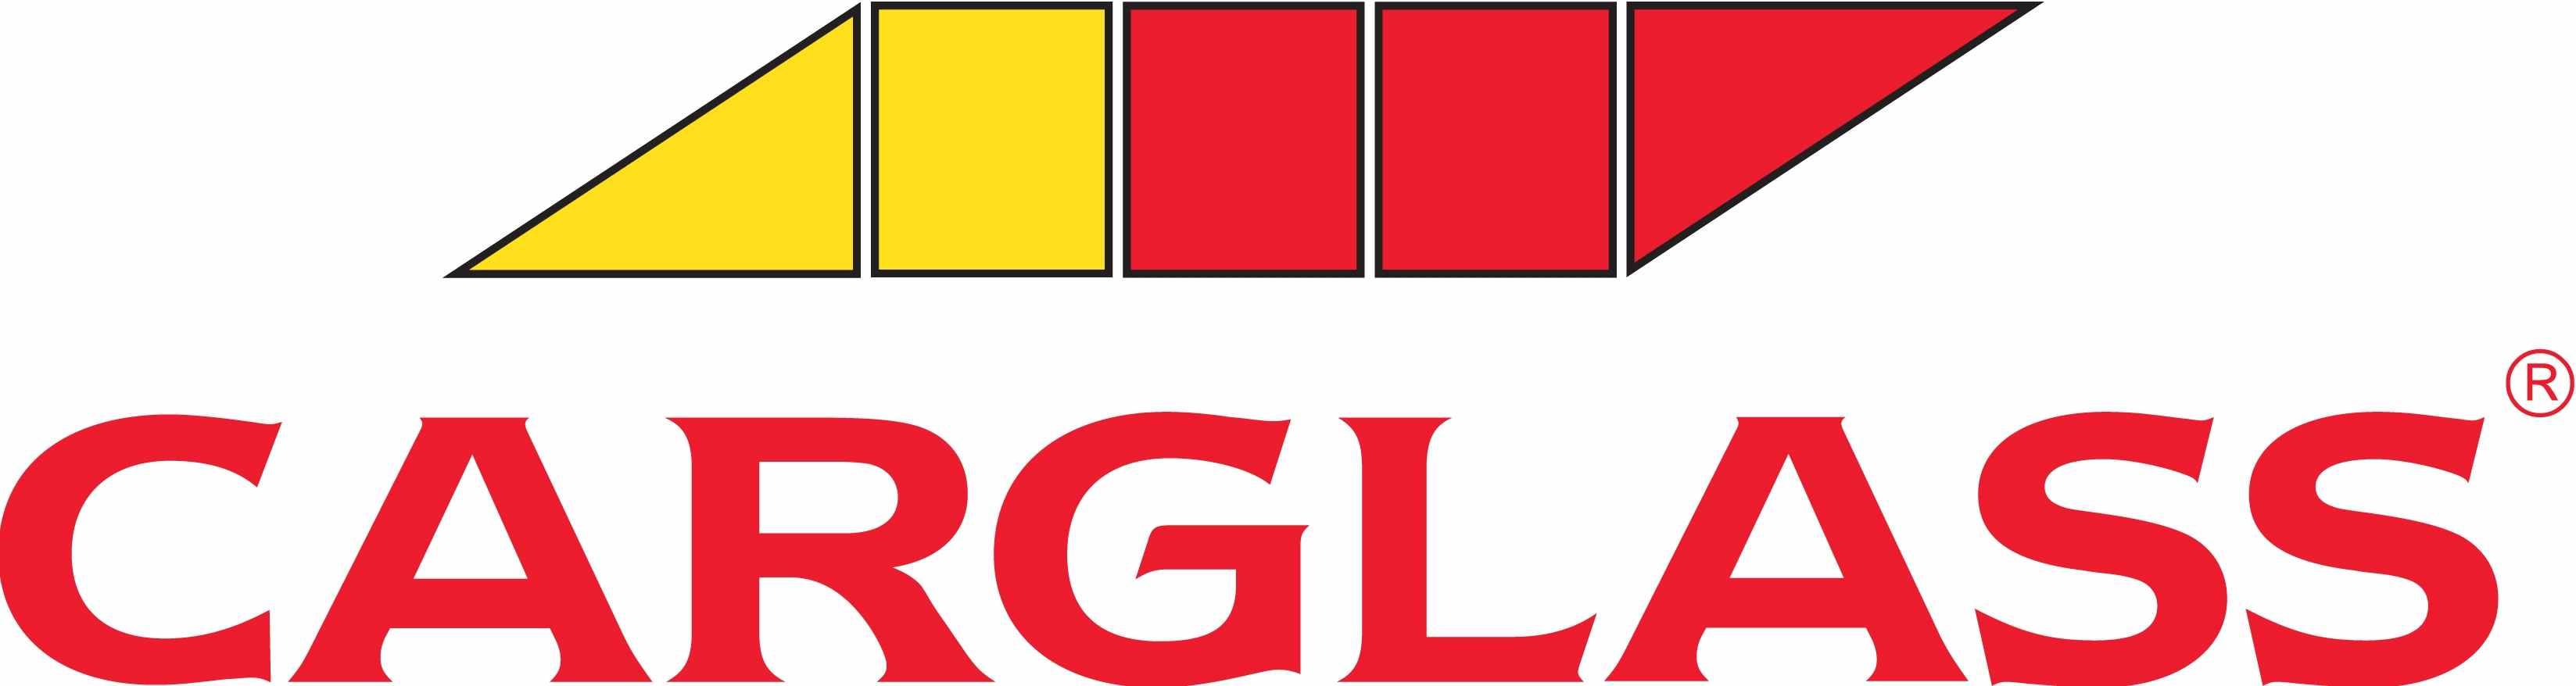 Gruppo Lercari & Carglass